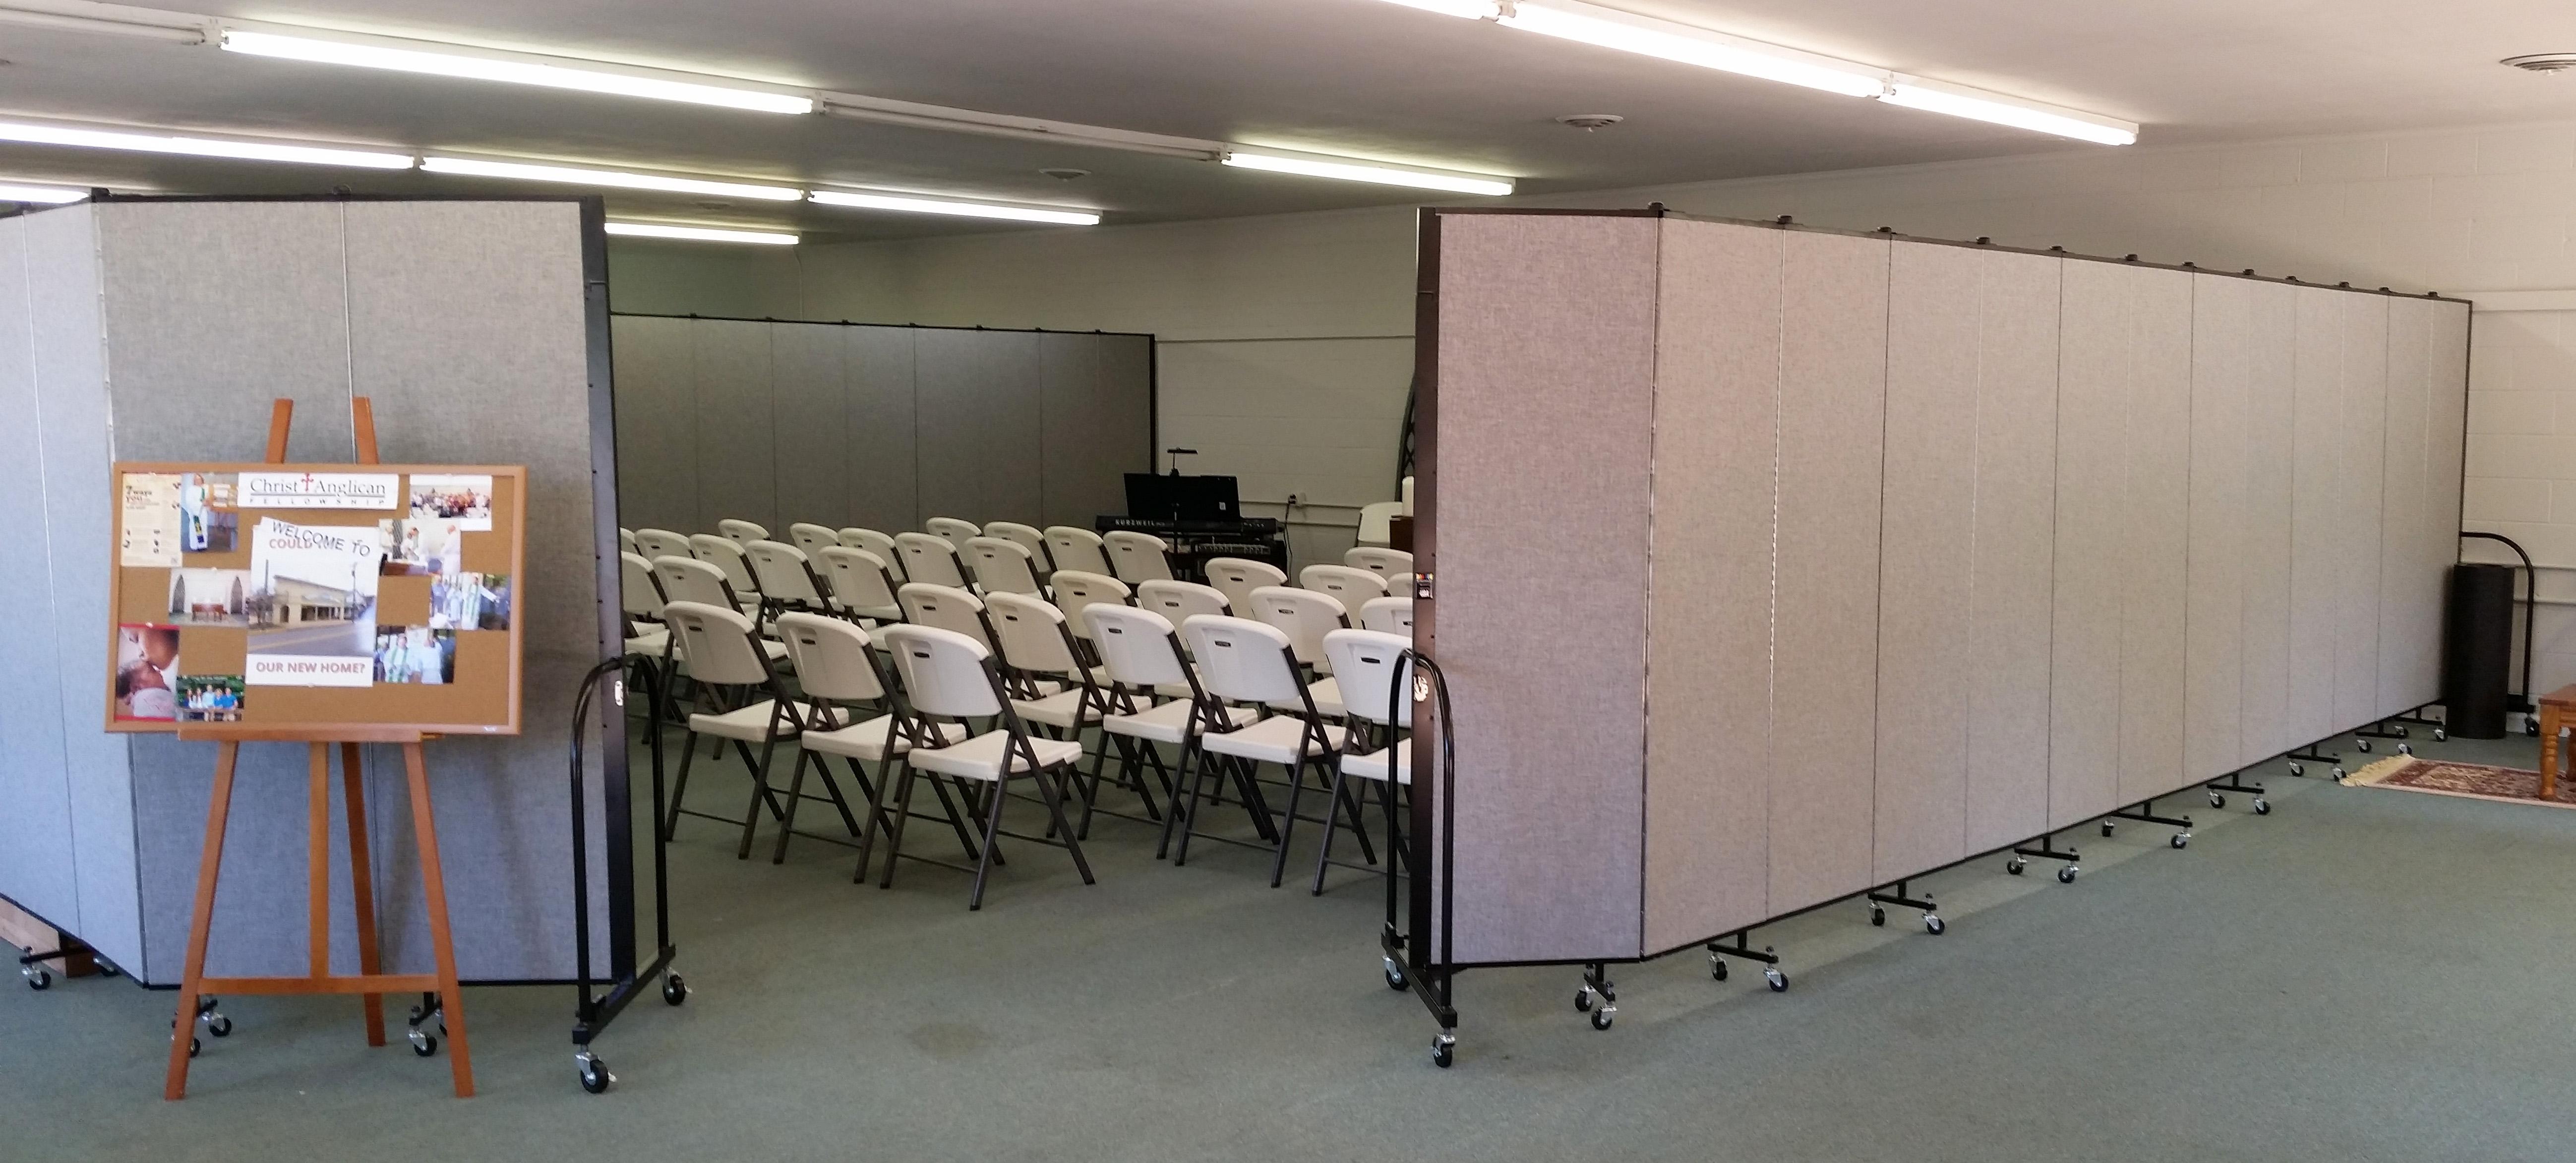 Church Growth Needs Screenflex Portable Room Dividers #3B5A90